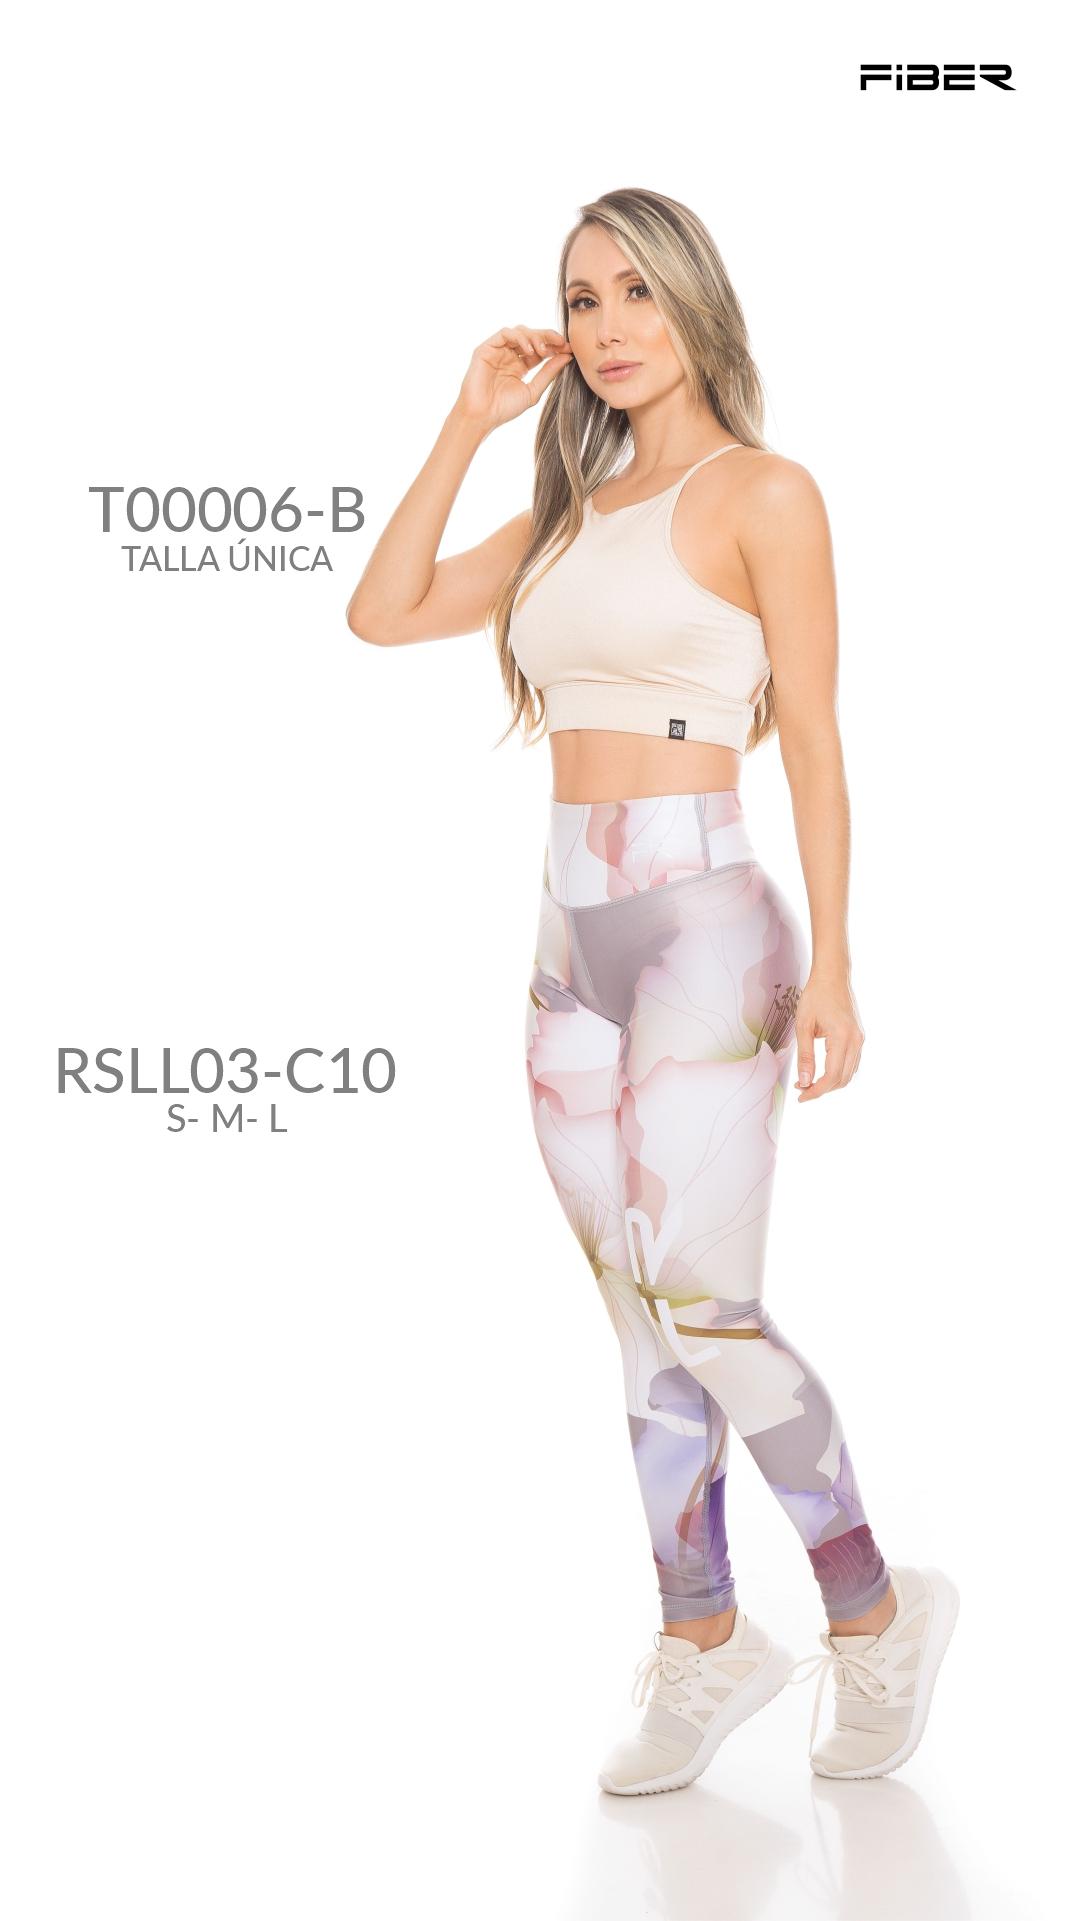 leggins fiber ropa deportiva colombiana en mexico